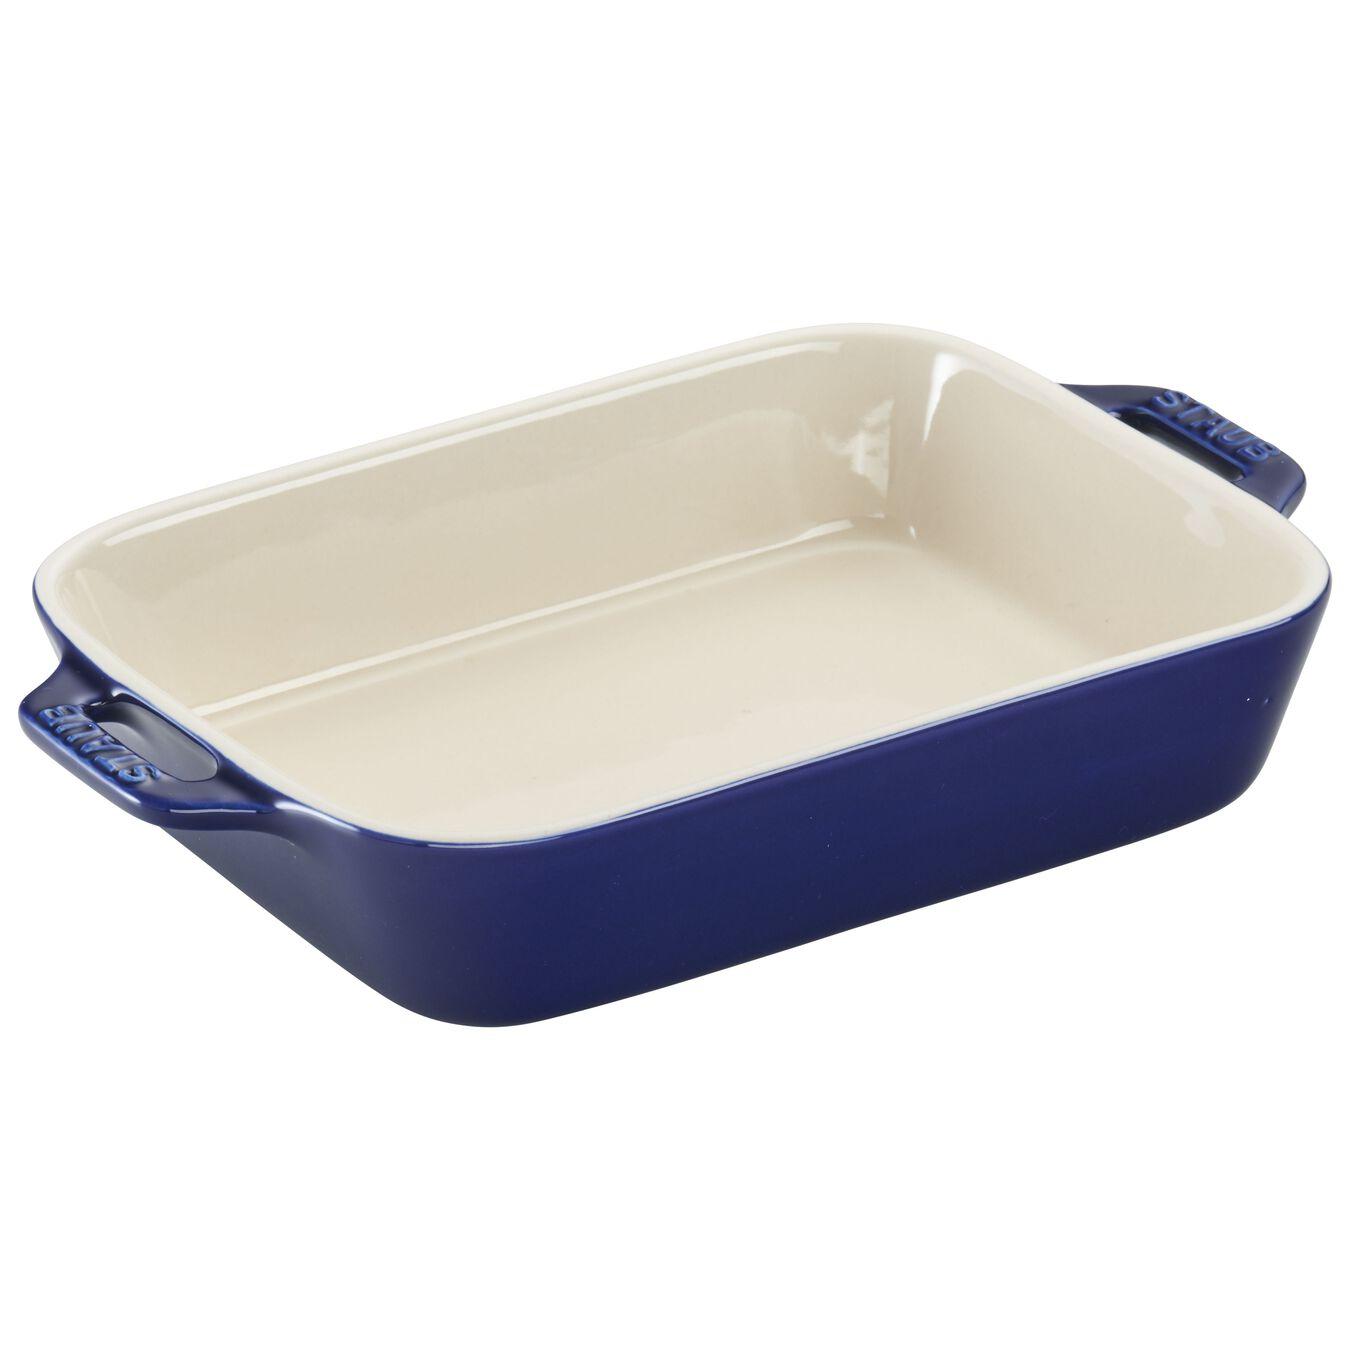 7.5-inch x 6-inch Rectangular Baking Dish - Dark Blue,,large 2